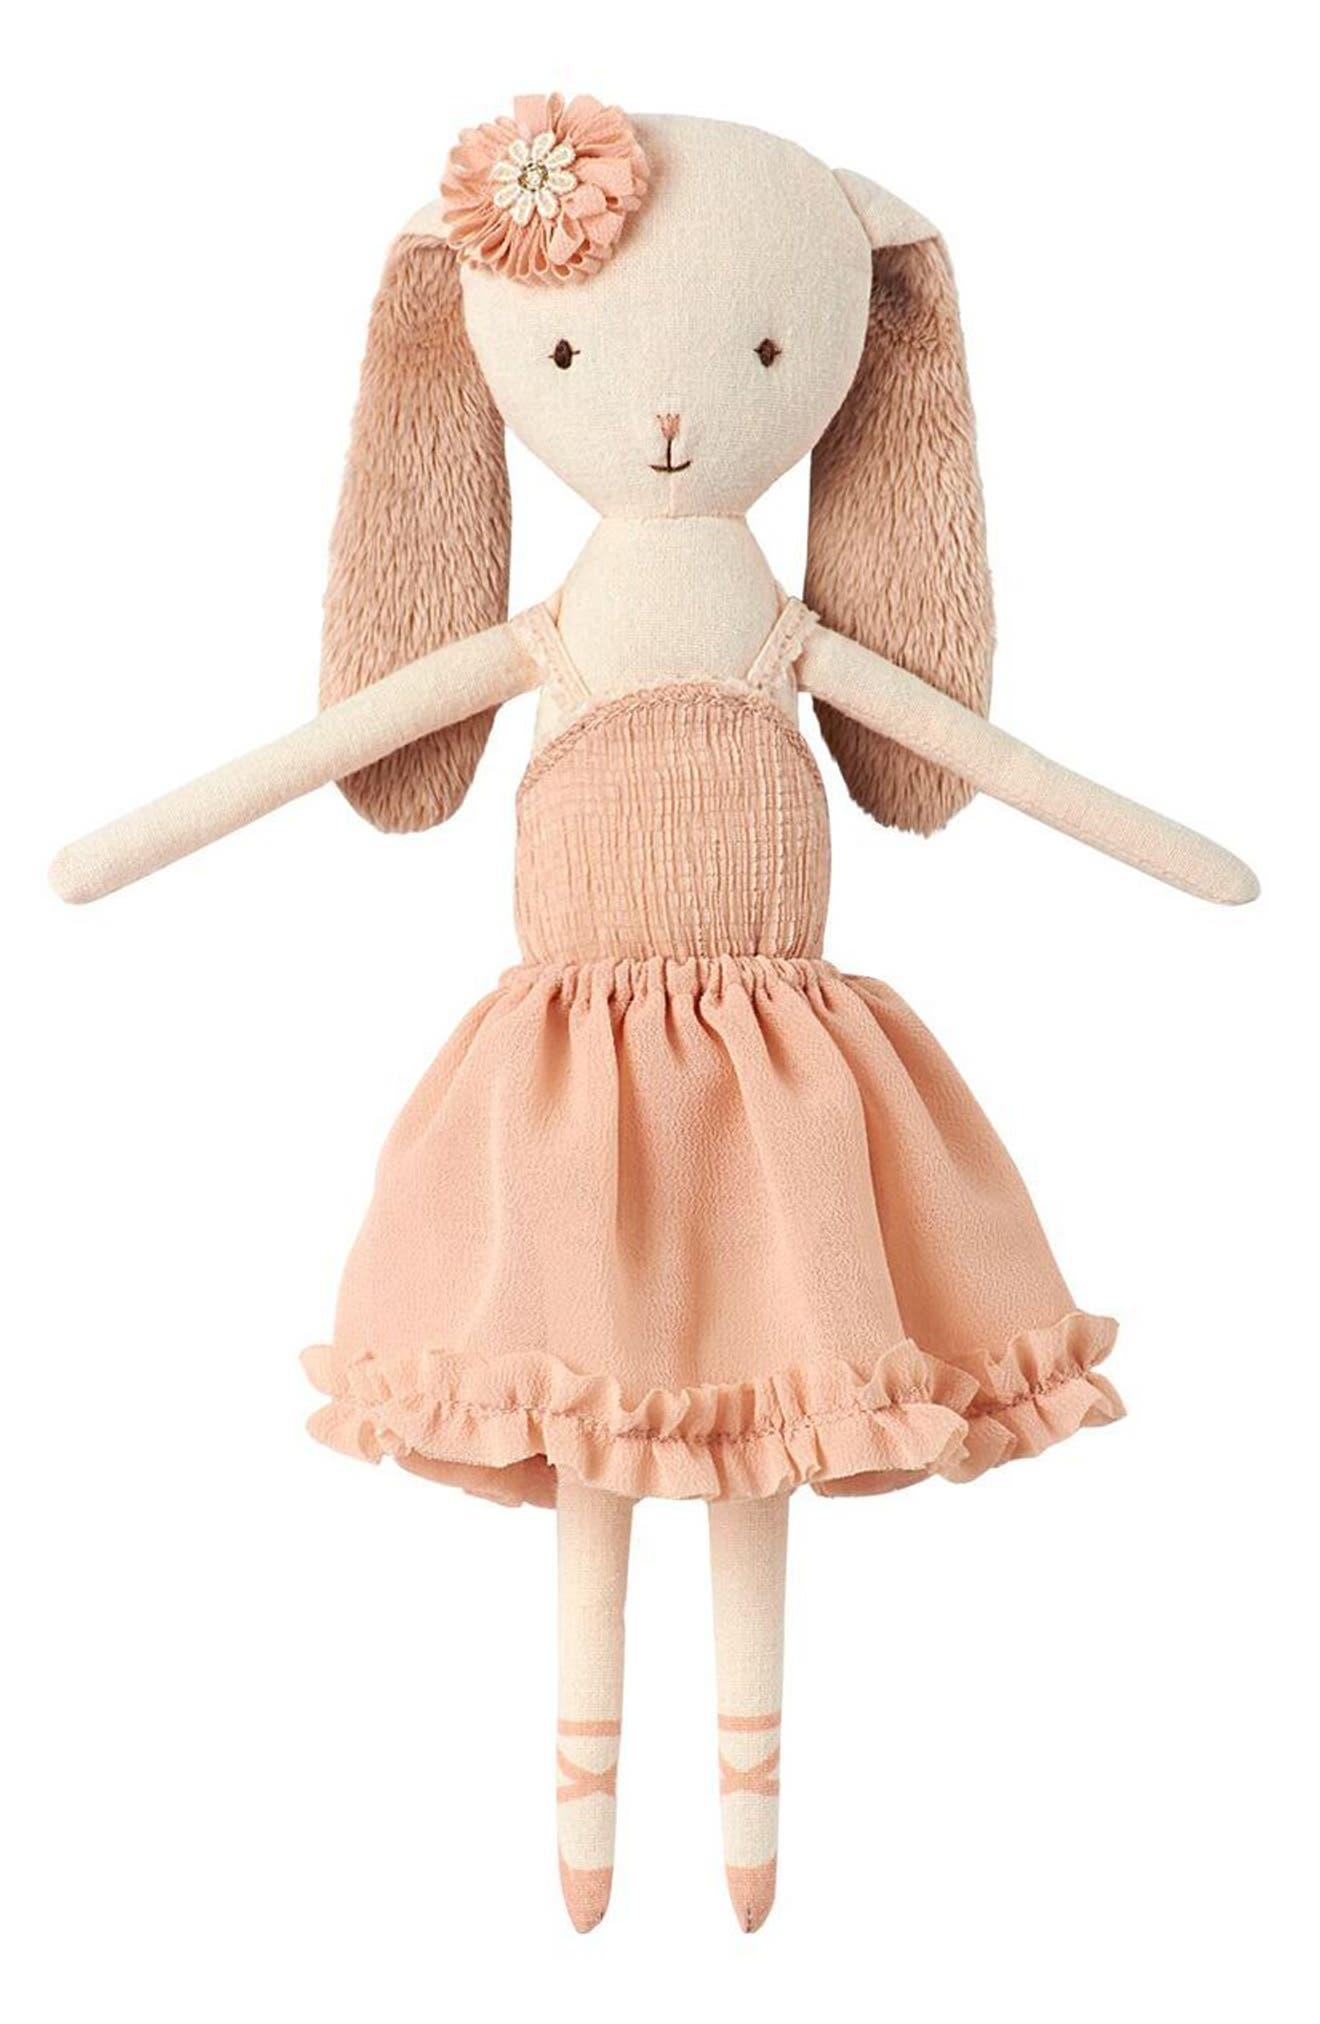 Dancing Bunny Stuffed Animal,                         Main,                         color, 650